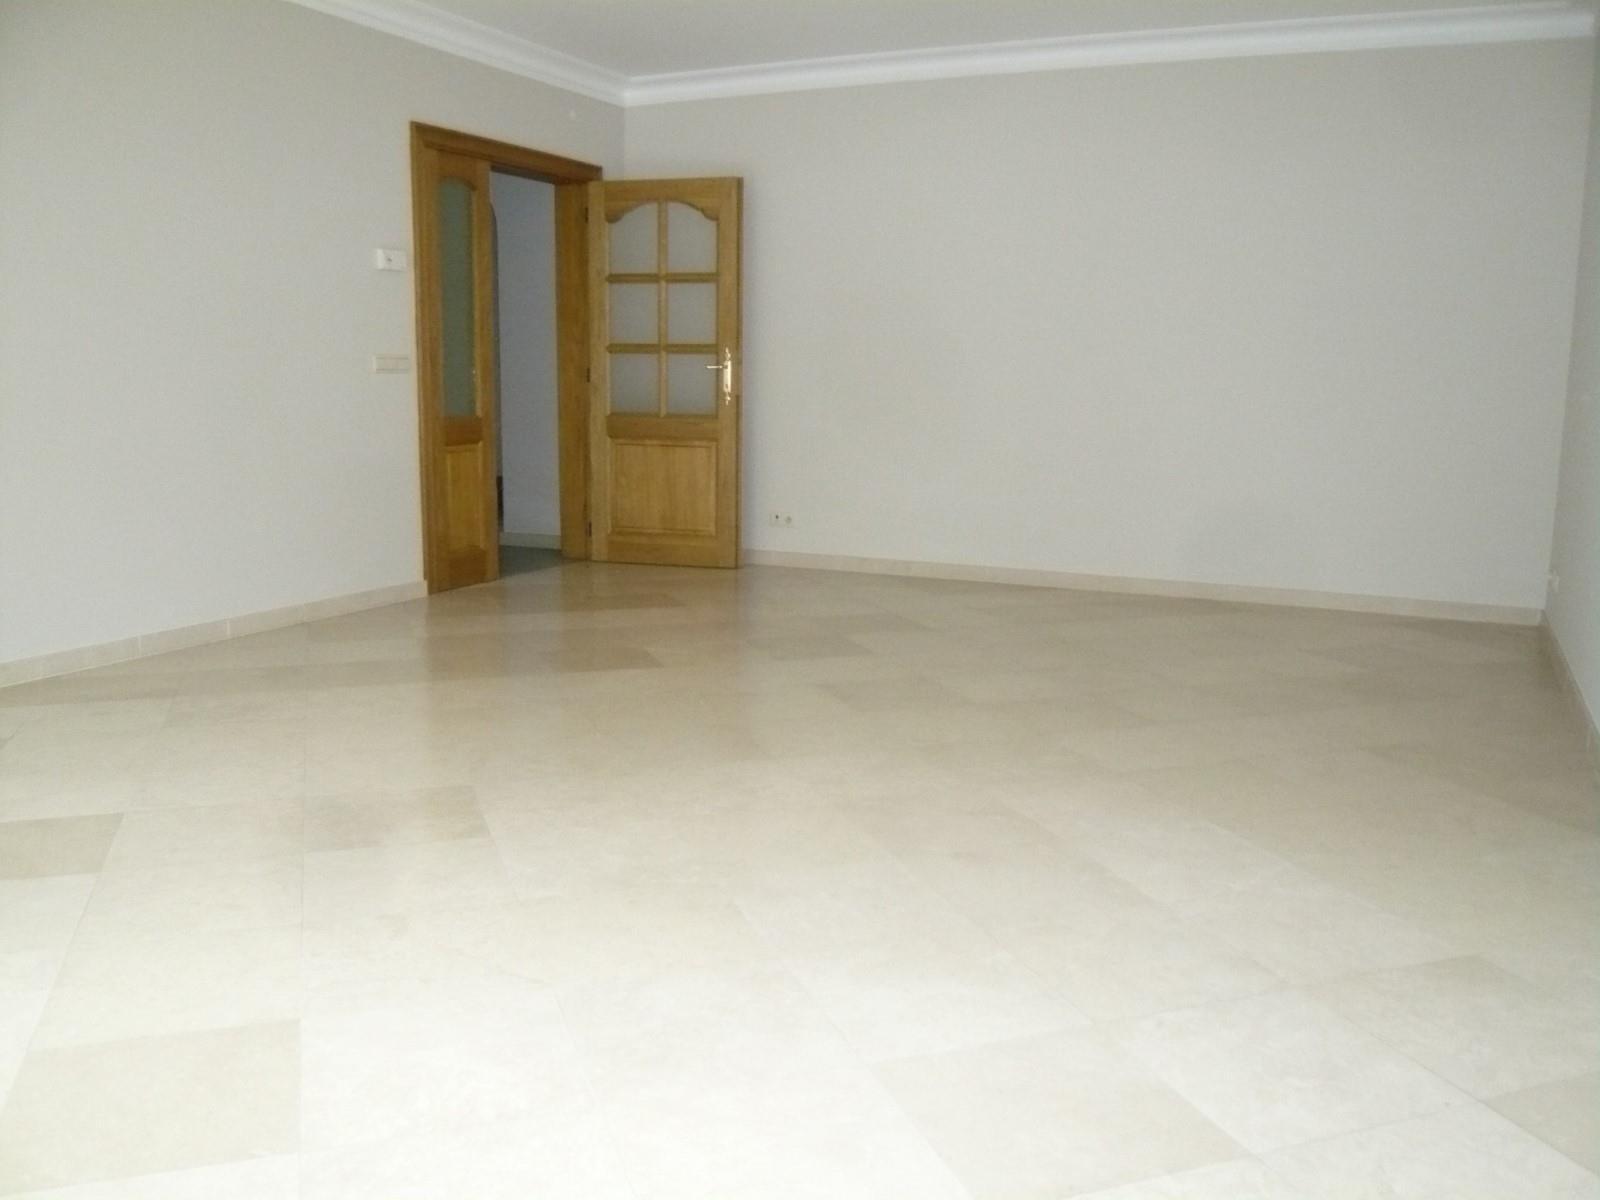 Appartement exceptionnel - Woluwe-Saint-Pierre - #2927607-2